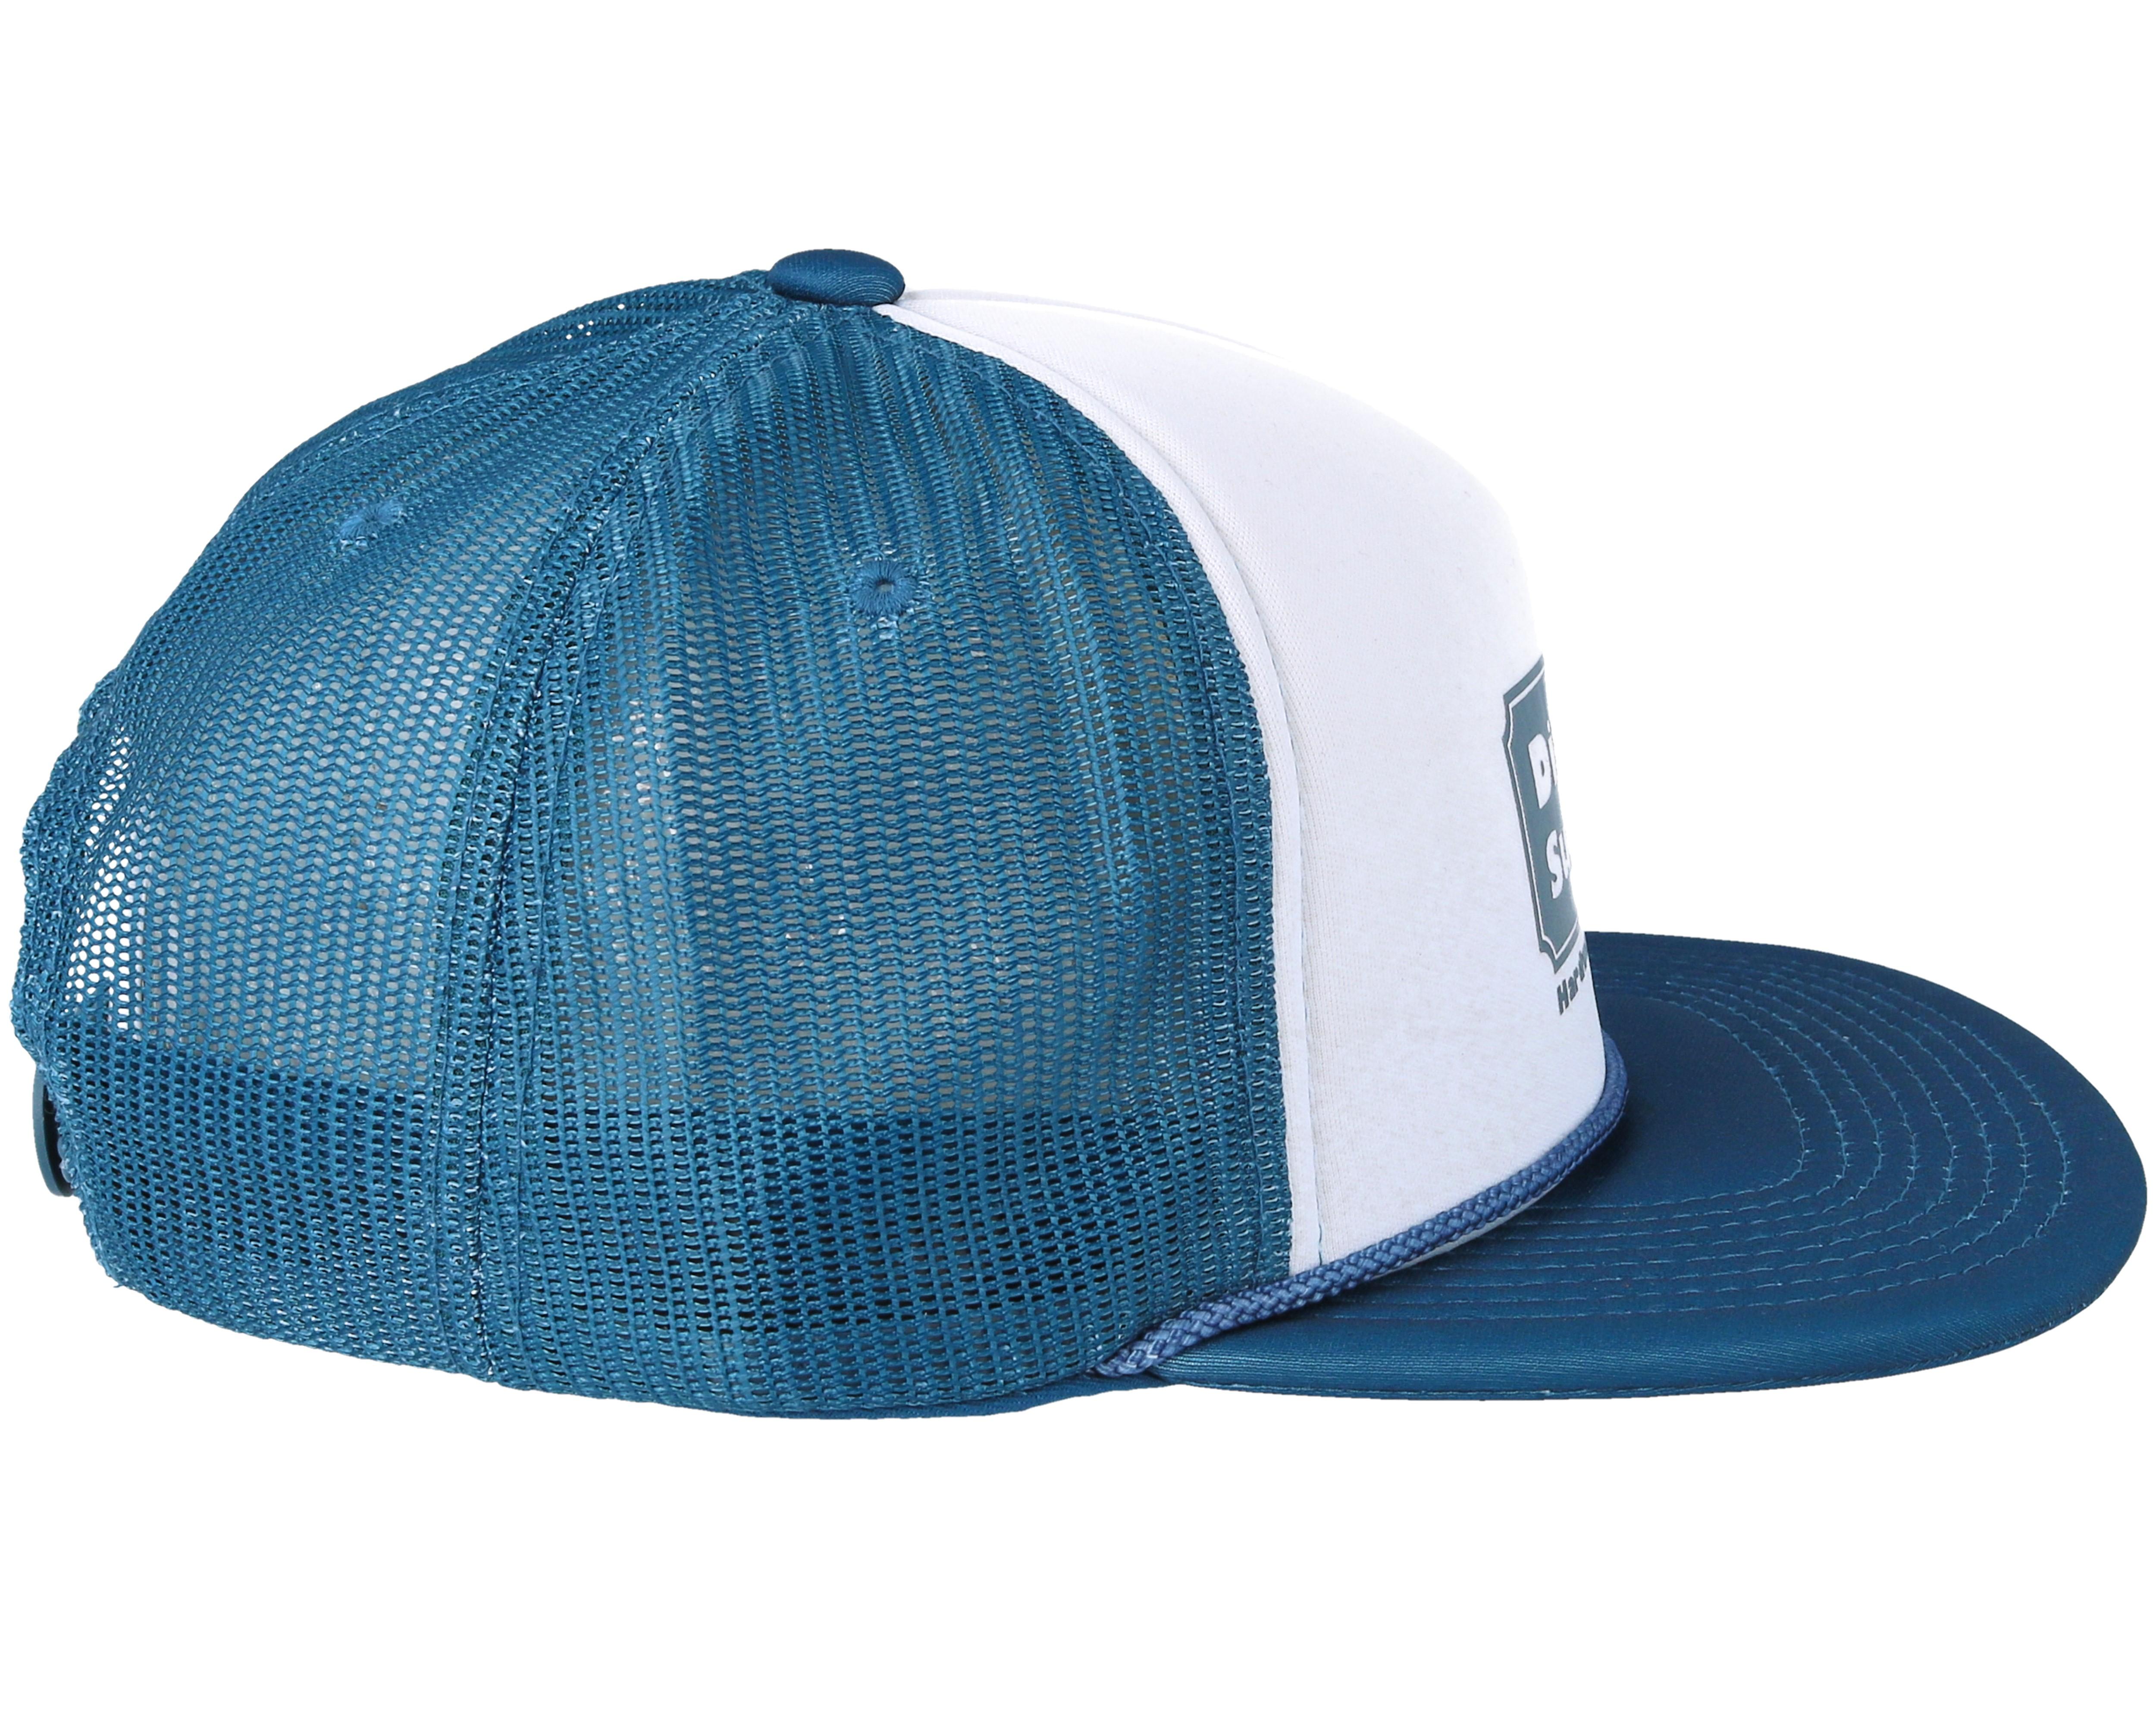 Hardware Trucker Navy Snapback Diamond Cap Hatstore Nl